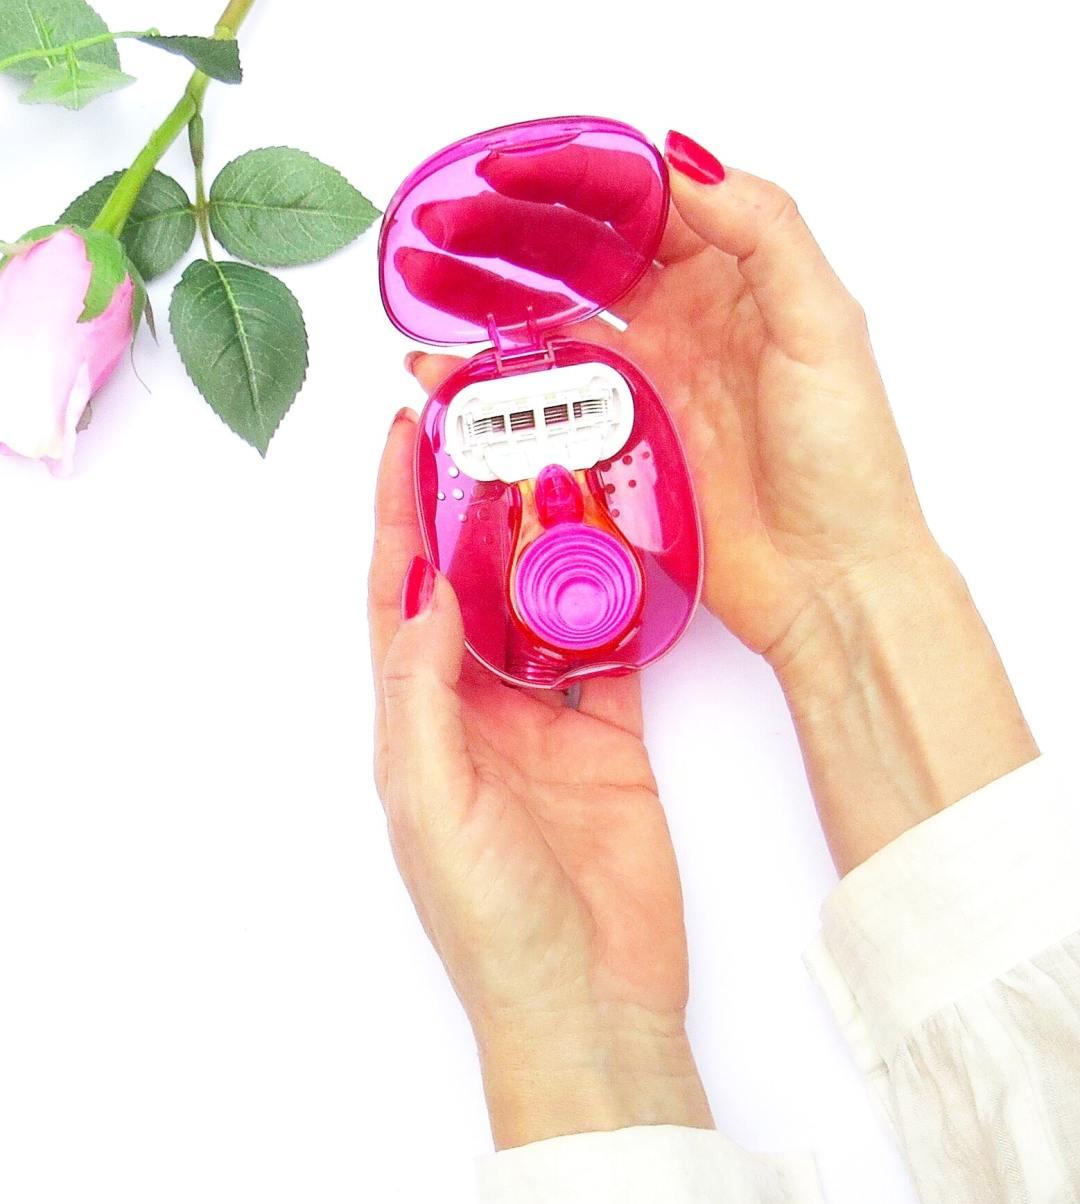 Gilette Venus travel razor holiday essentials